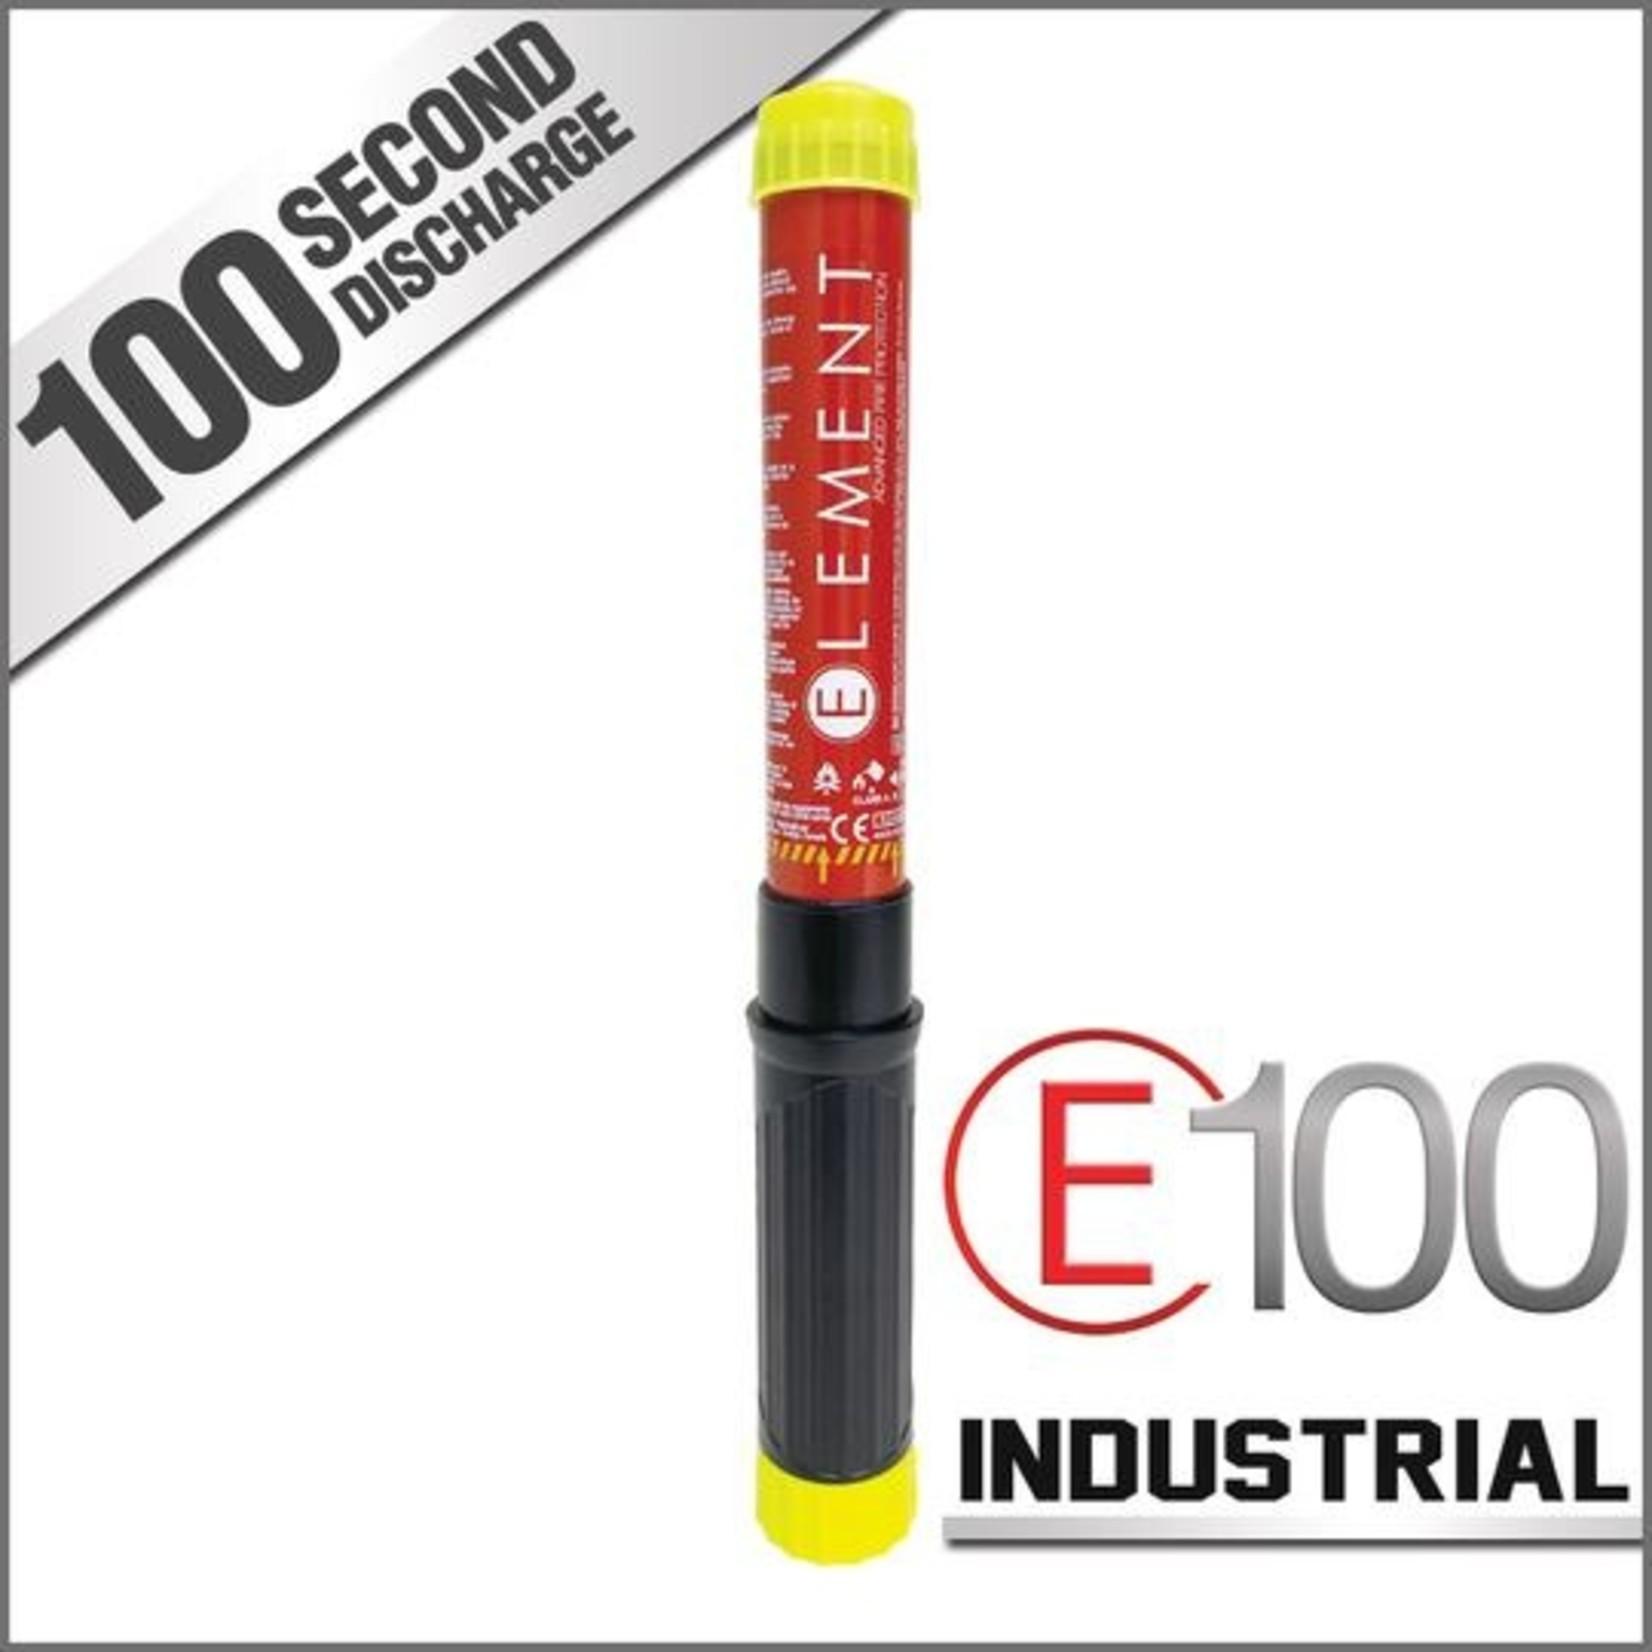 Element E100 Portable Fire Extinguisher